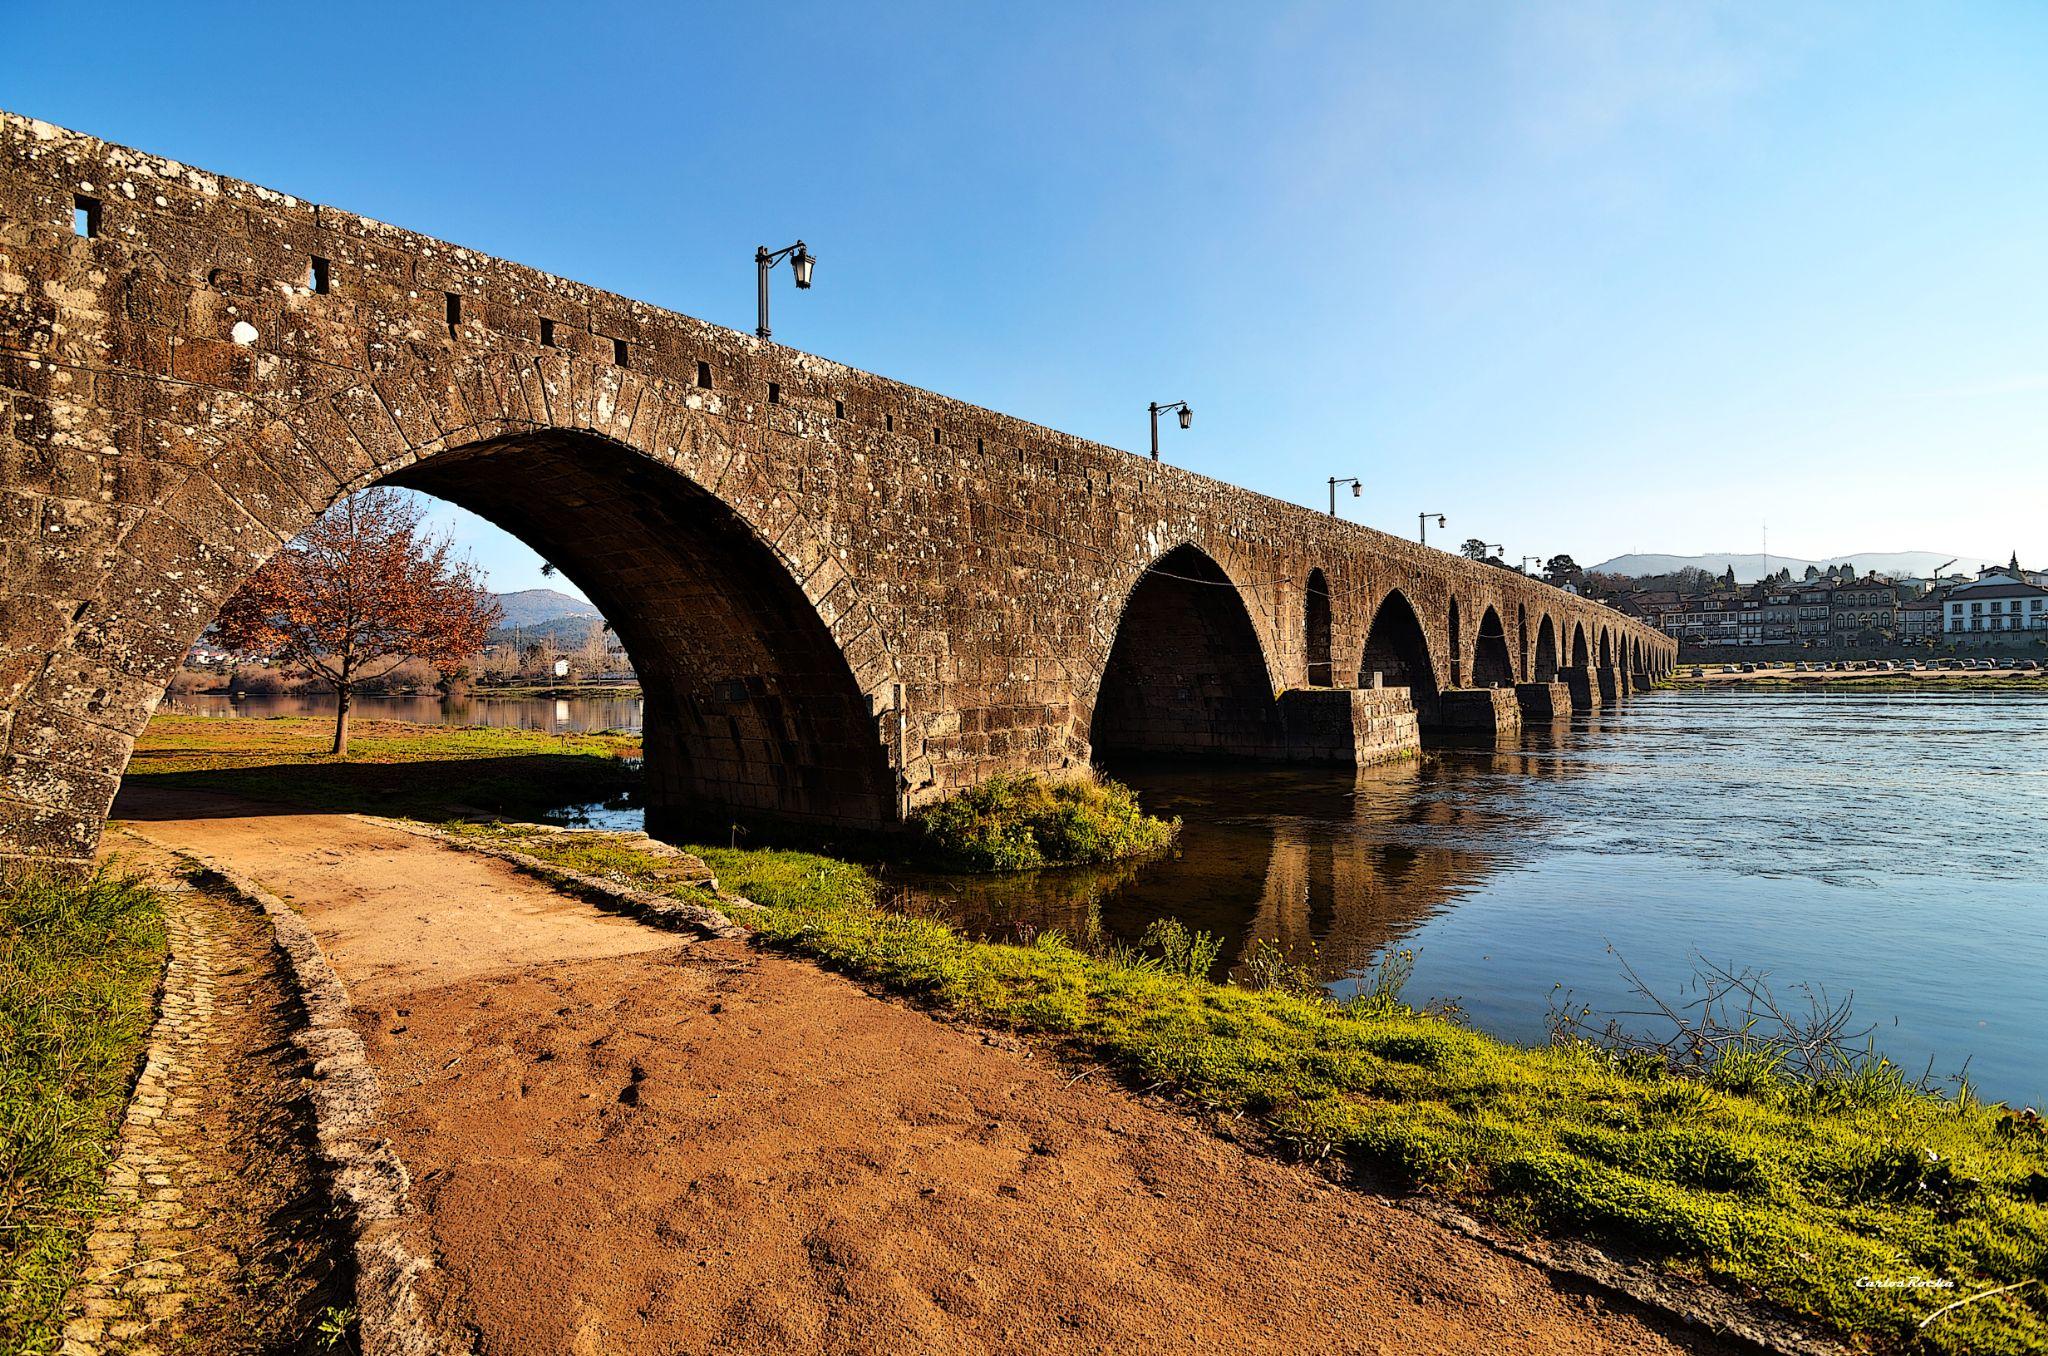 Ponte Romana by carlosfiuzar